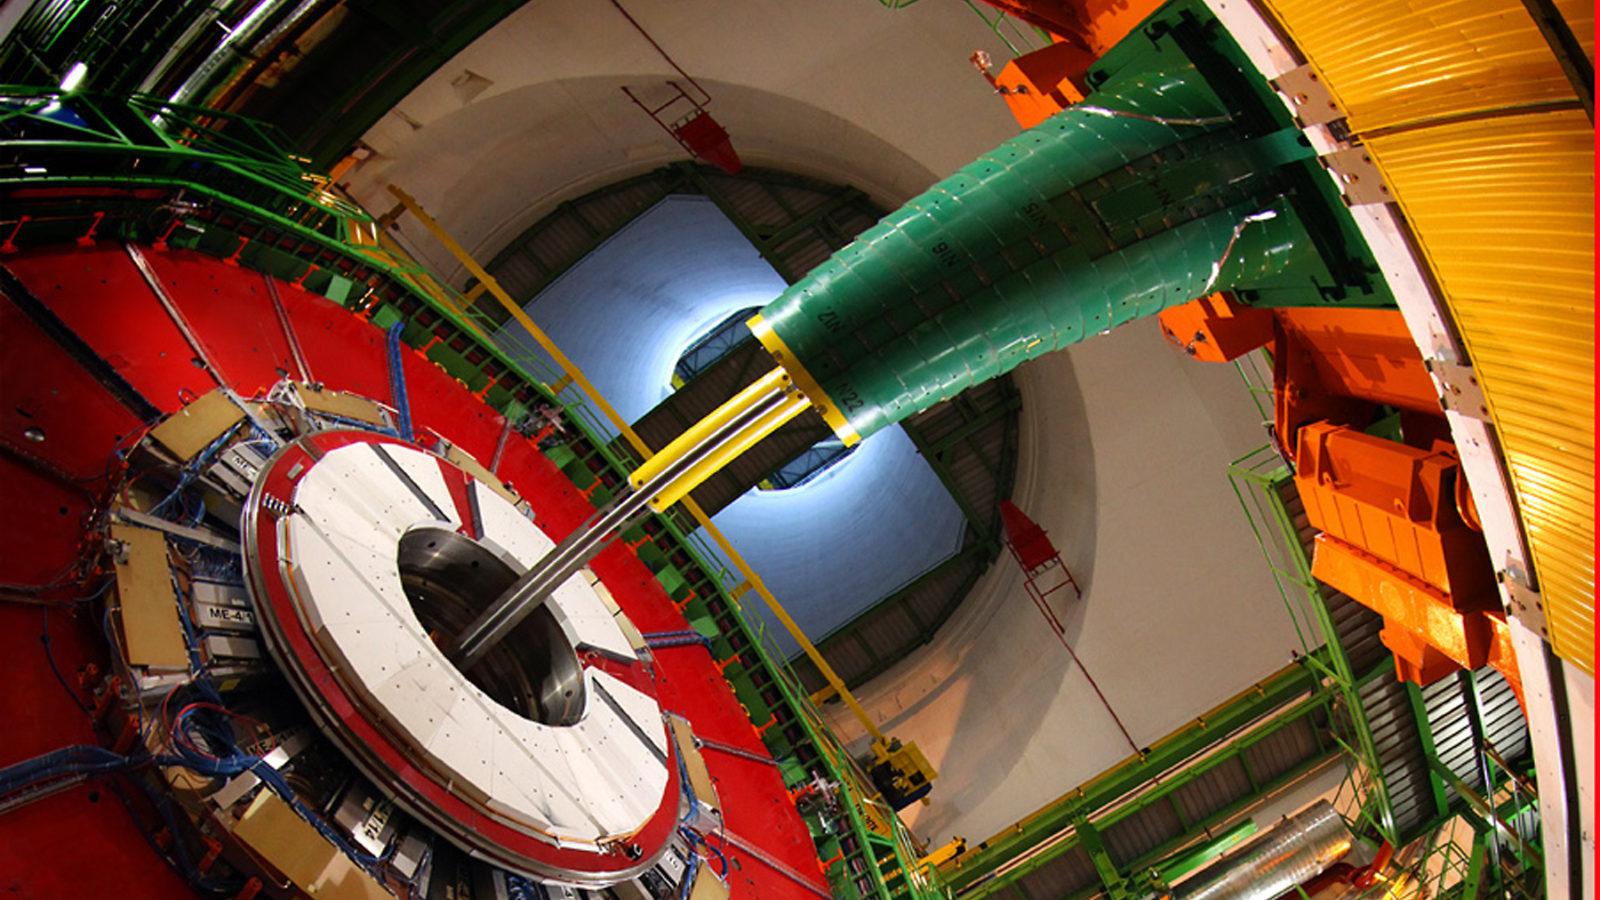 Photo of CMS detector below